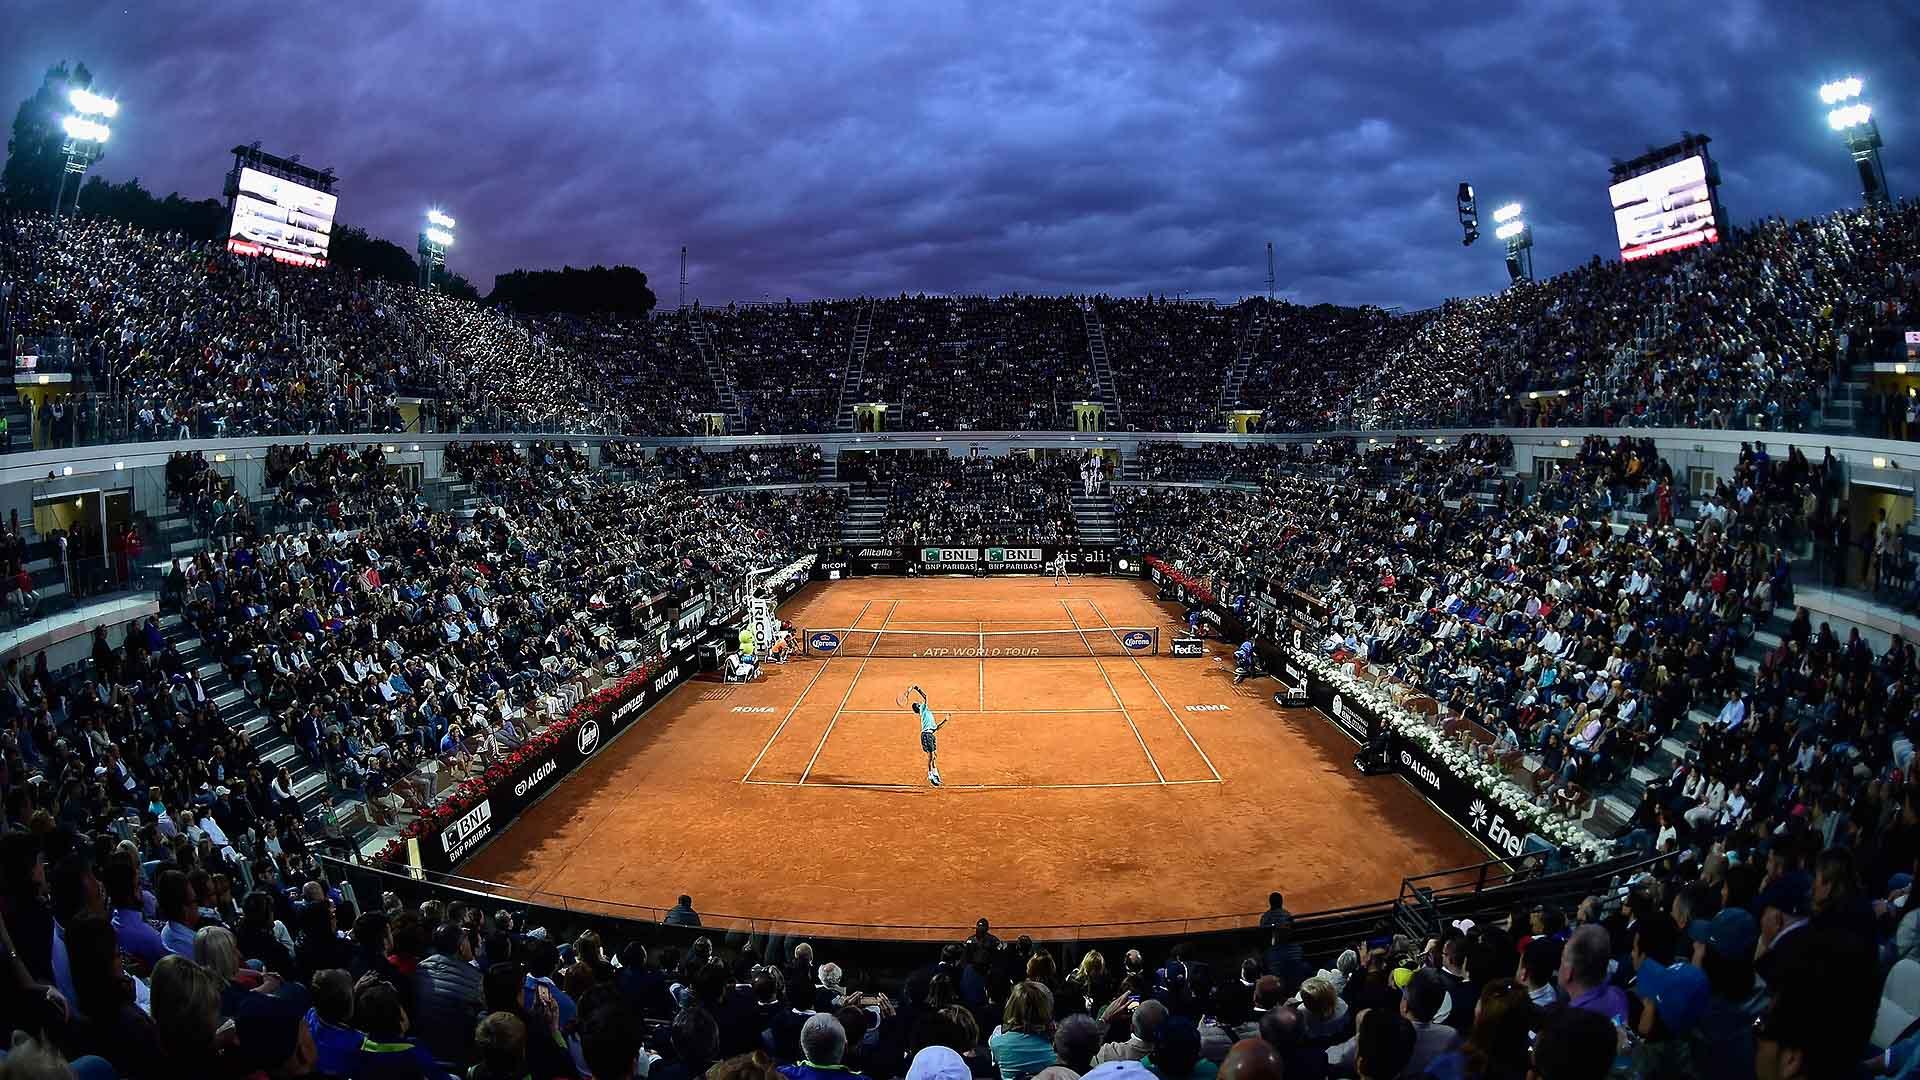 Italian Open 2021 Seating Guide Championship Tennis Tours